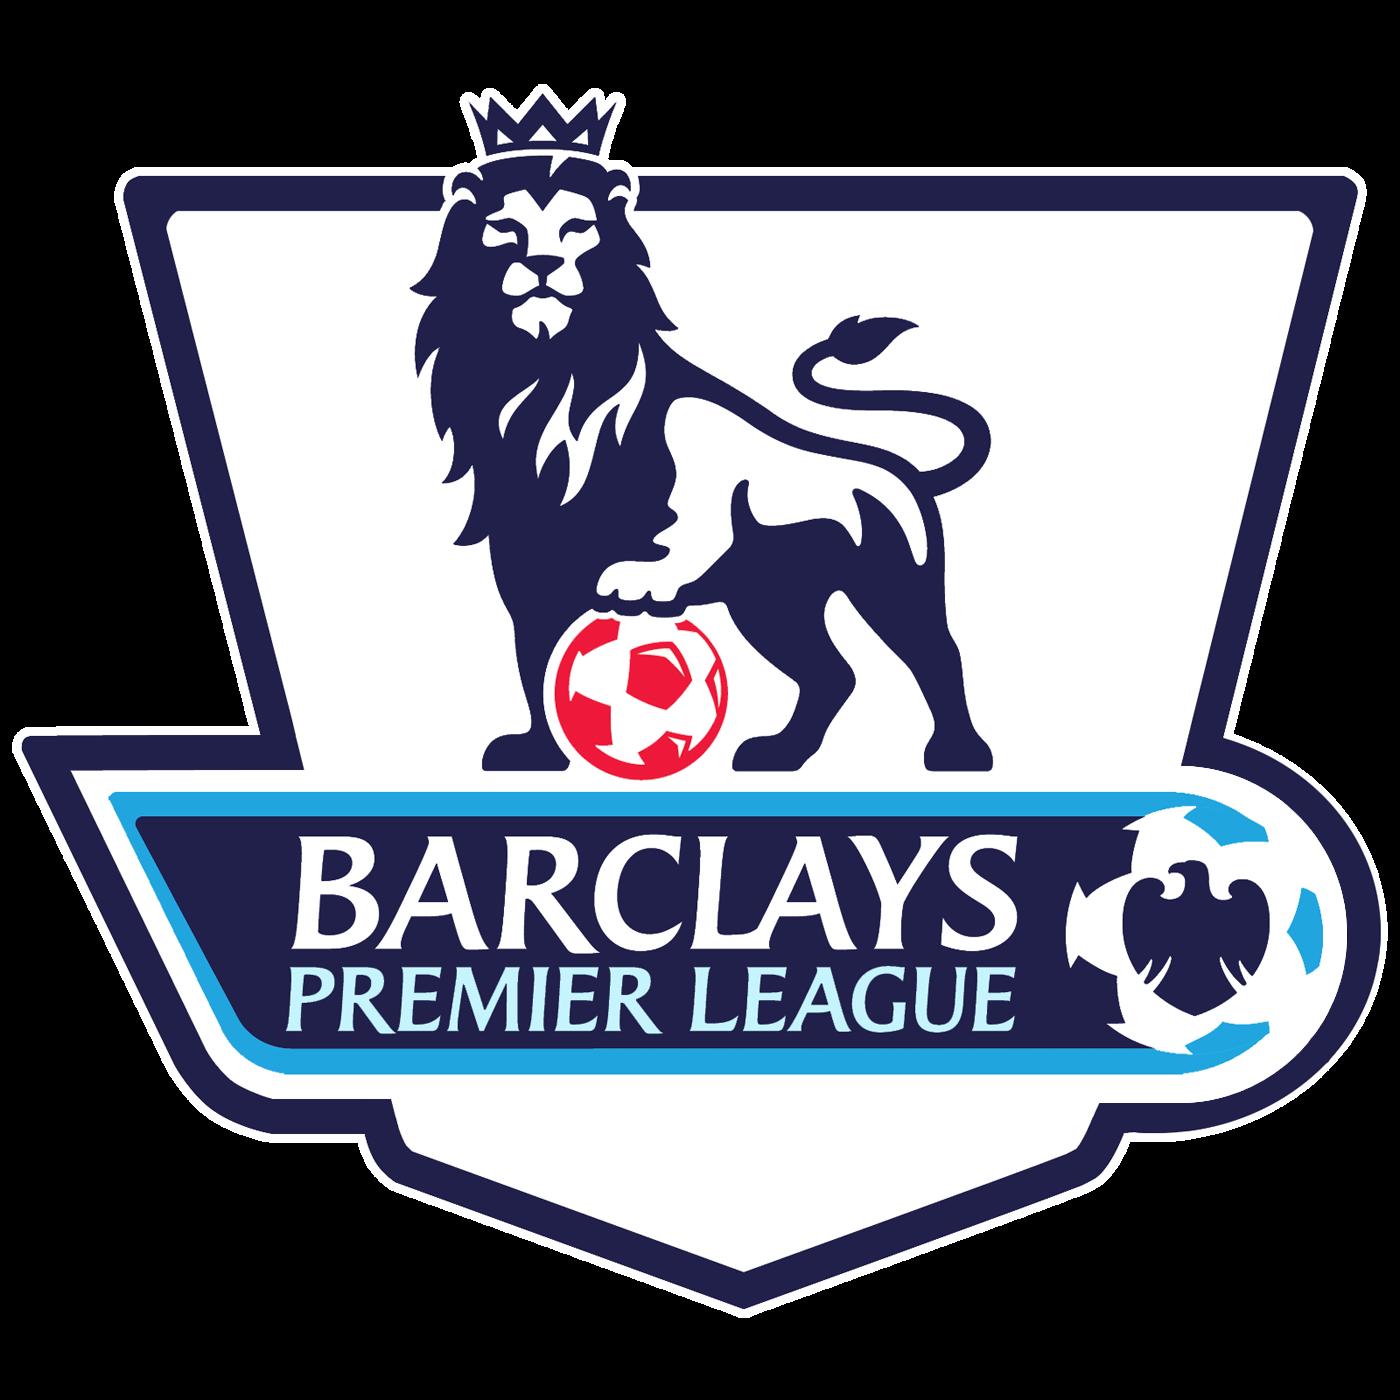 Liga Inggris 2014-2015 Barclays Premier League